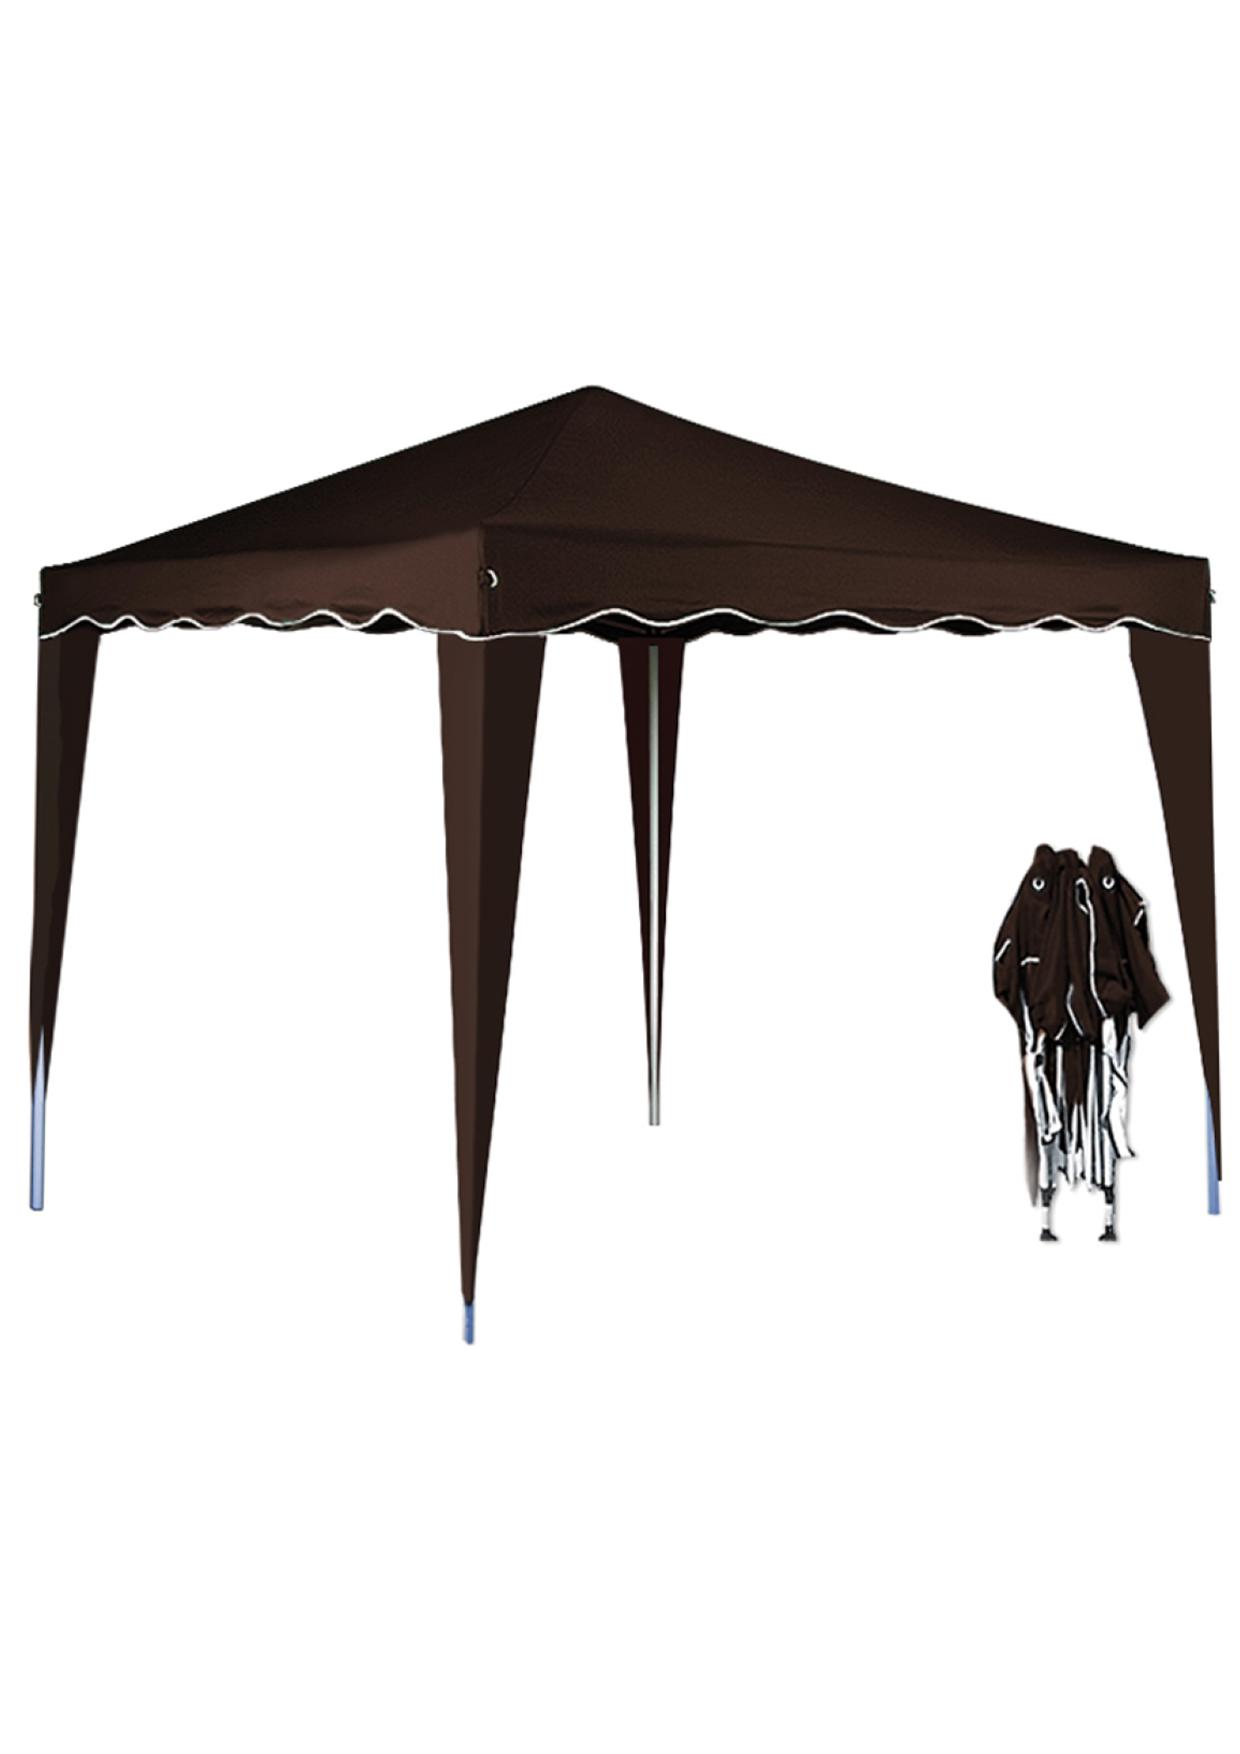 pavillon klappbar braun dietschys gmbh. Black Bedroom Furniture Sets. Home Design Ideas